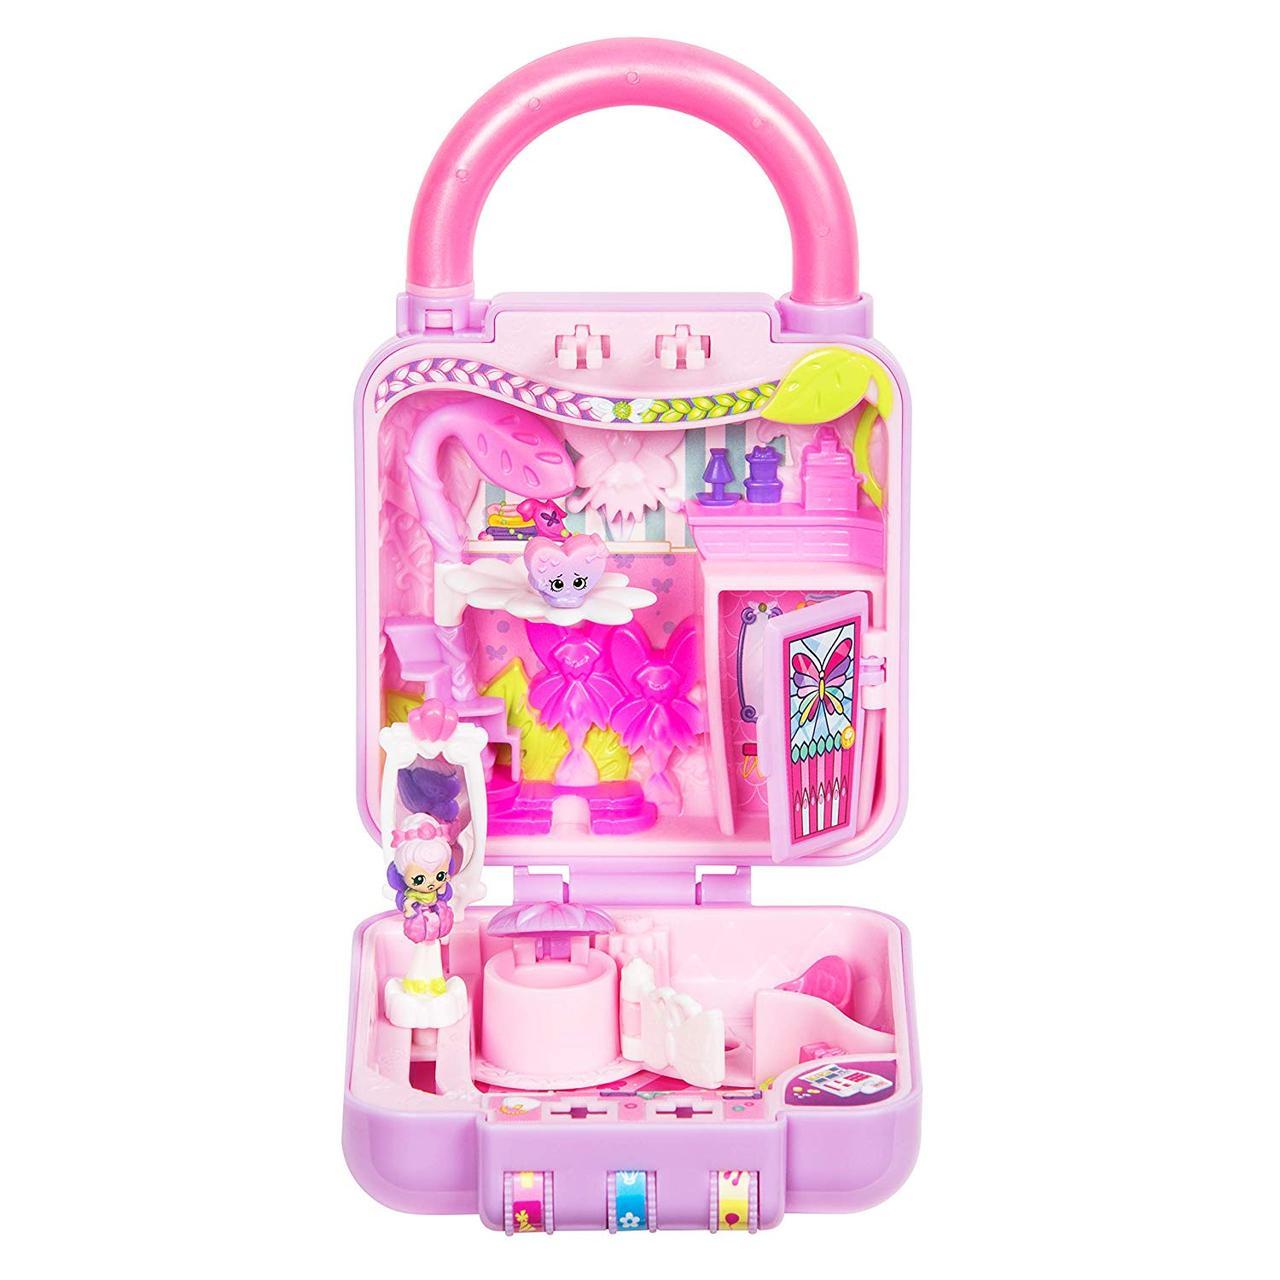 Shopkins Секретный Замок Секреты Лили - Фея моды Lil' Secrets Secret Lock - Fab Fairy Fashions